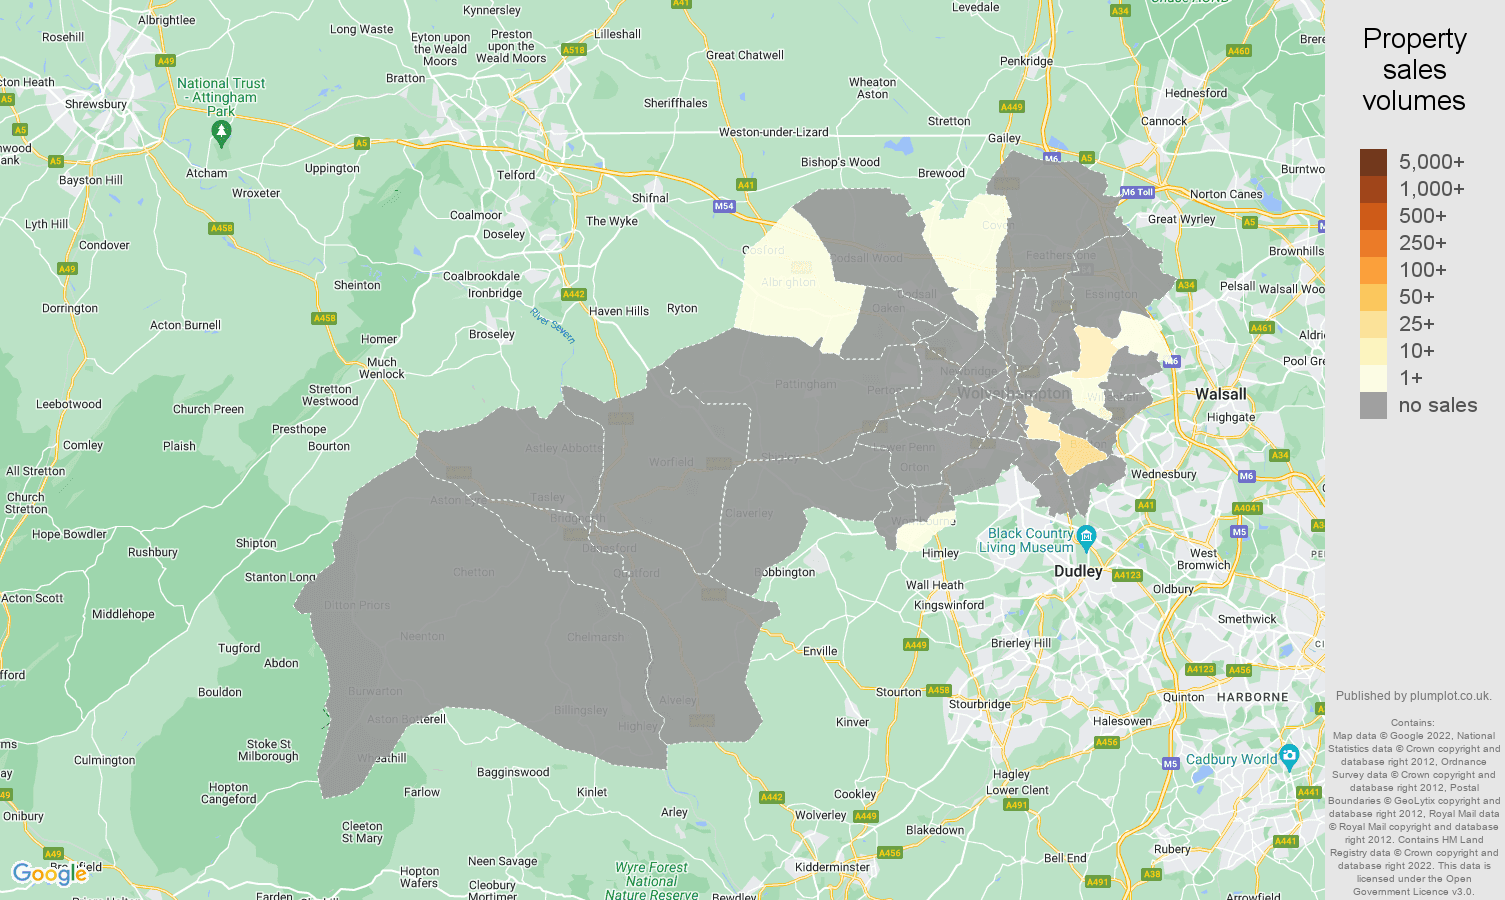 Wolverhampton map of sales of new properties